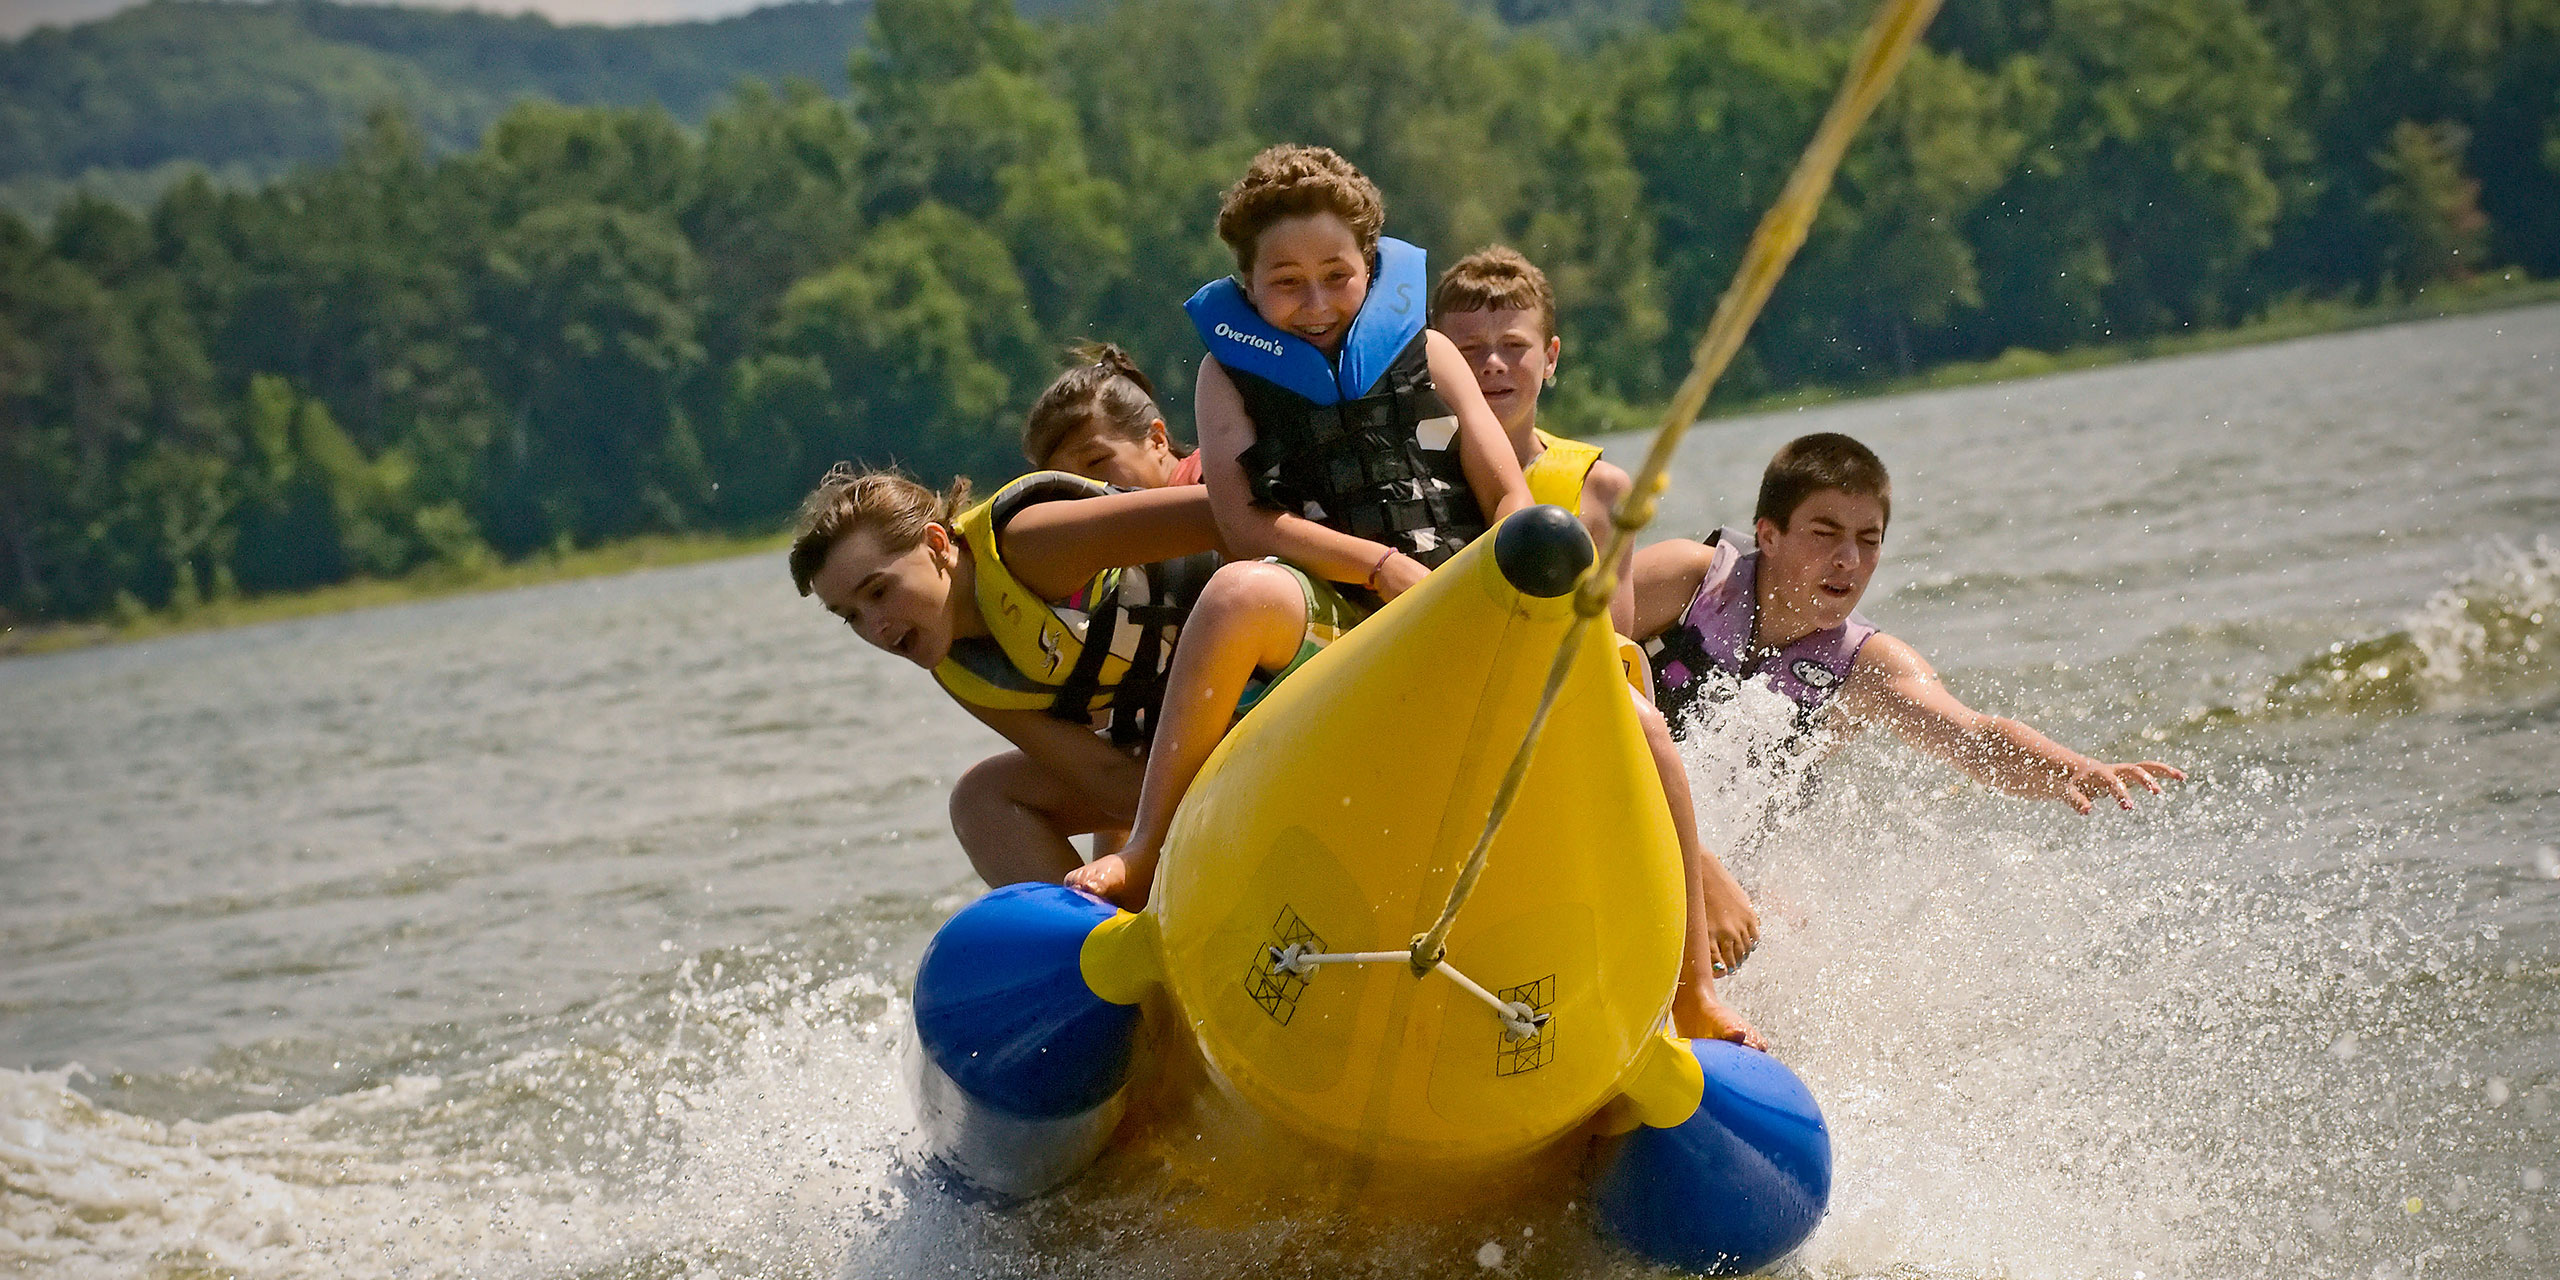 Banana Boating at Tyler Place Family Resort; Courtesy of Tyler Place Family Resort